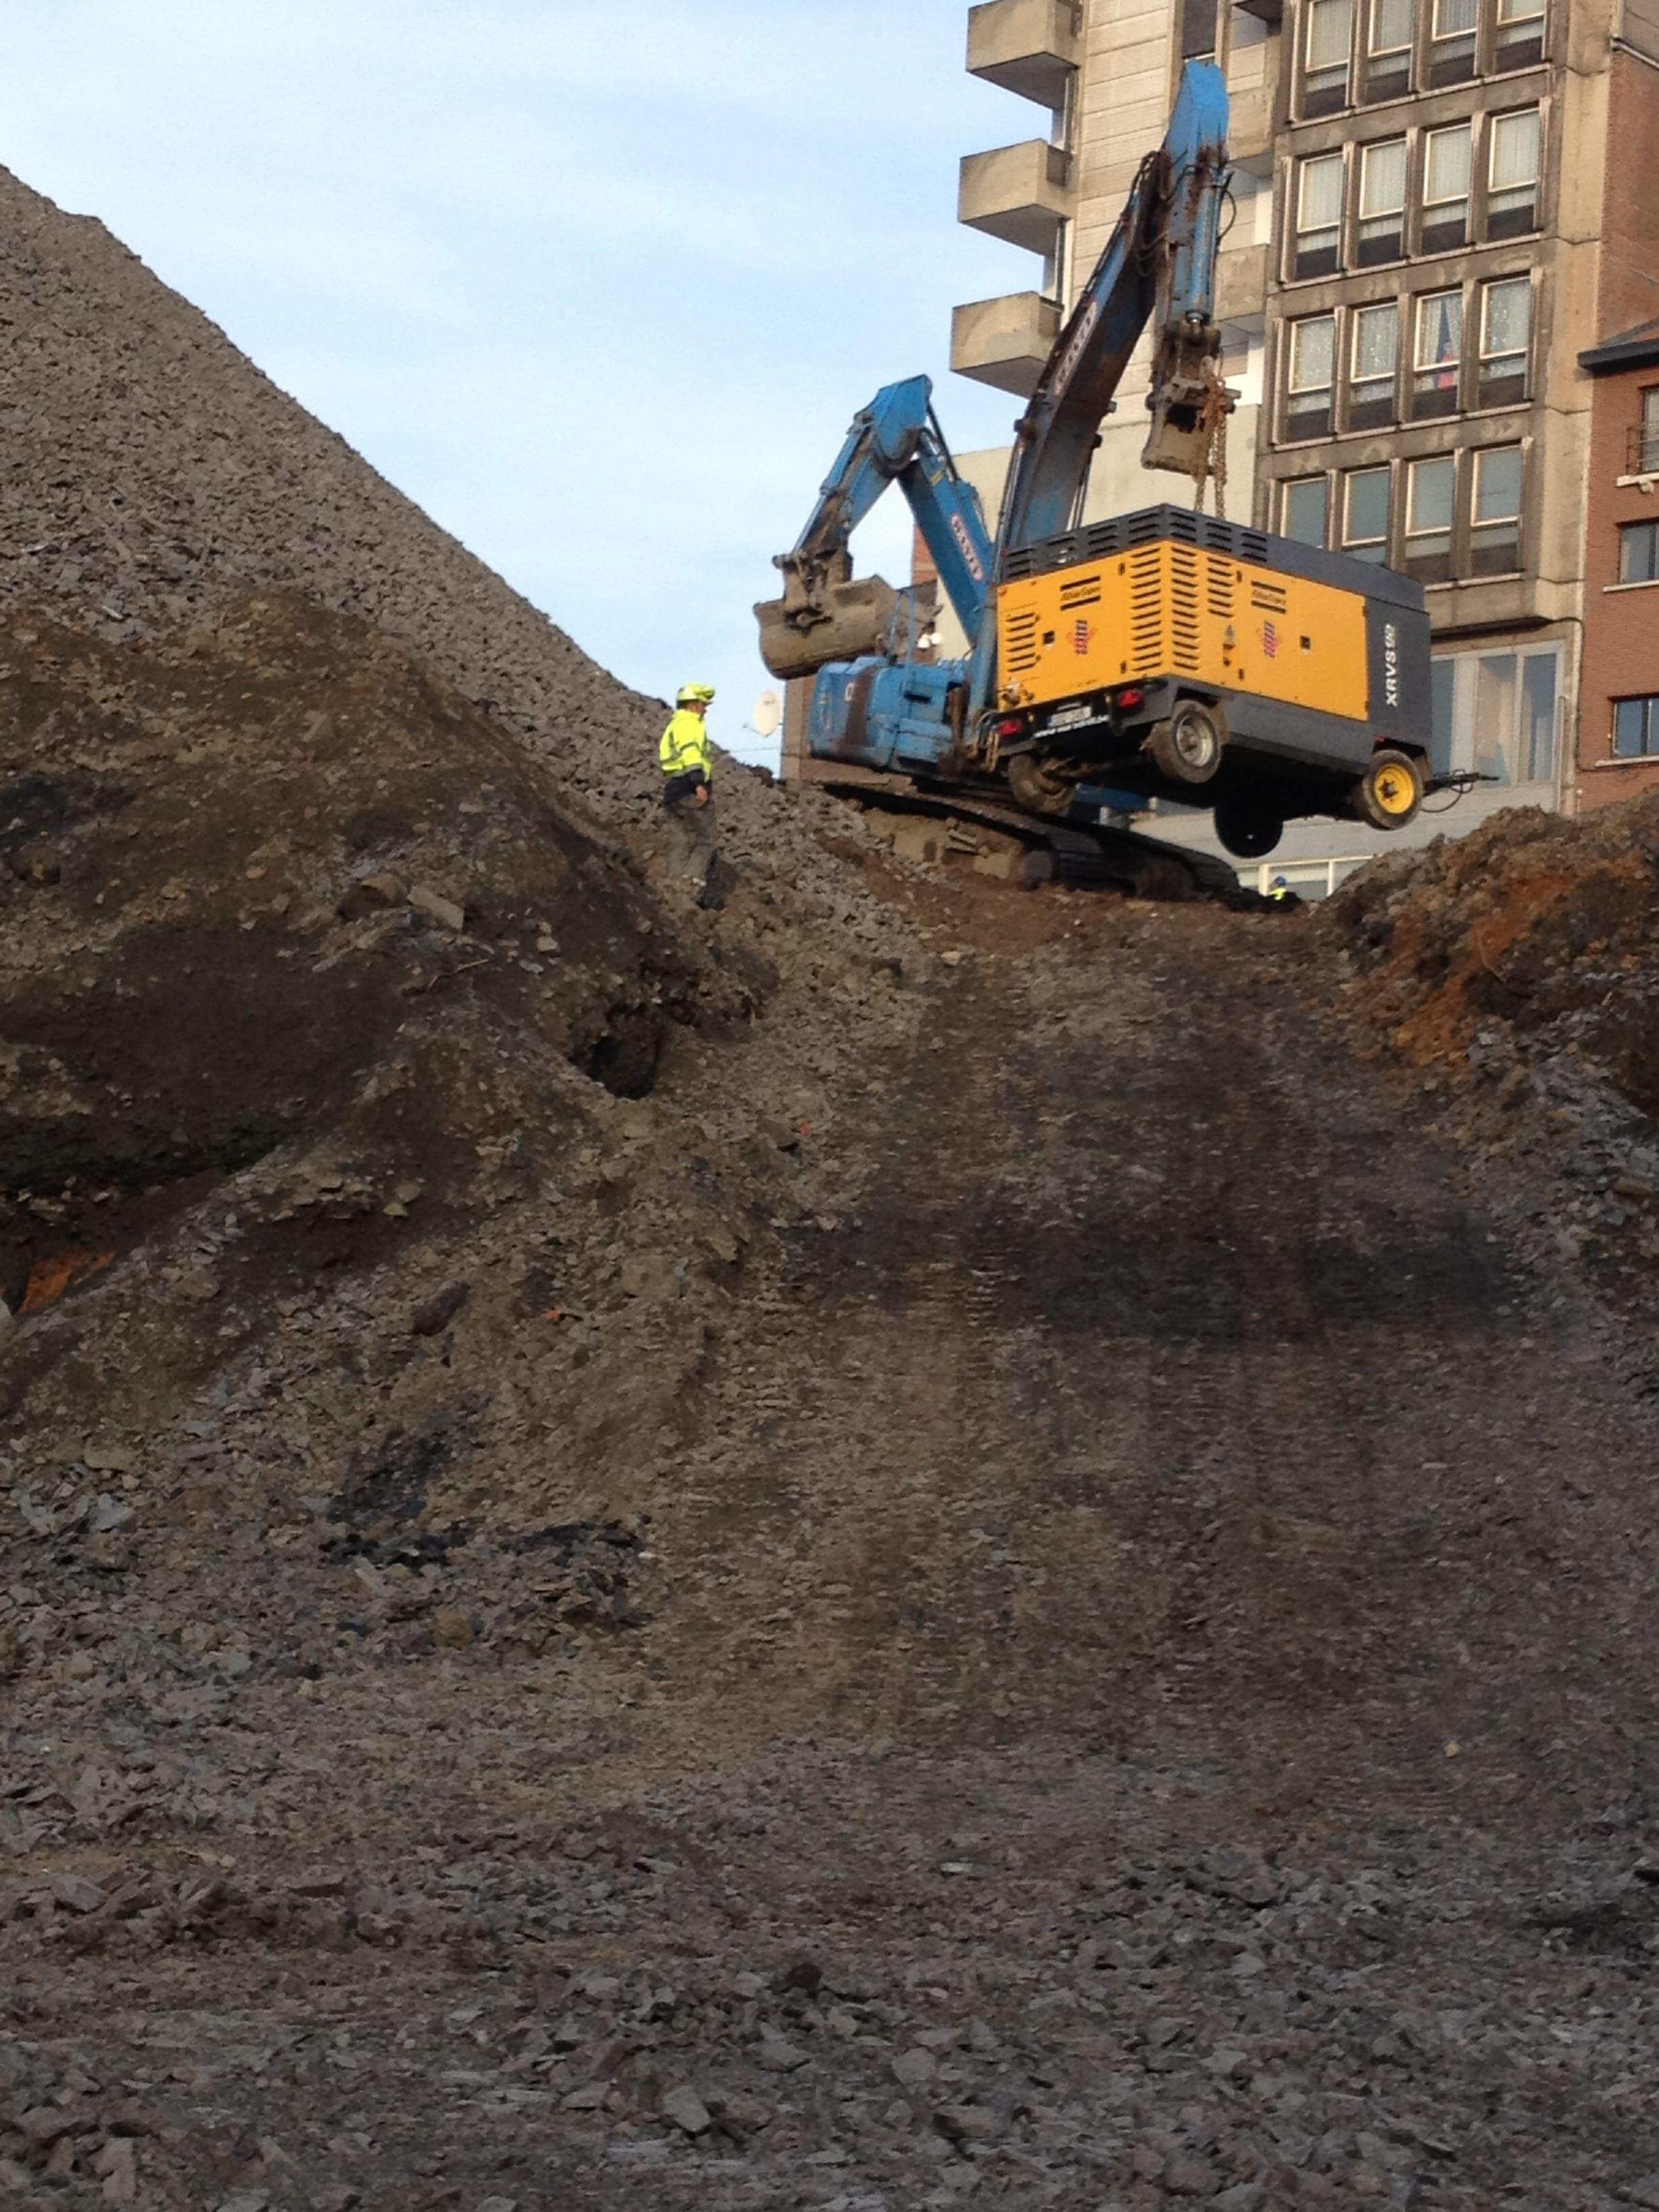 chantier-charleroi-rive-gauche-forage-installation-pompe-puits-geothermie-eurodrill-liege-belgique-2